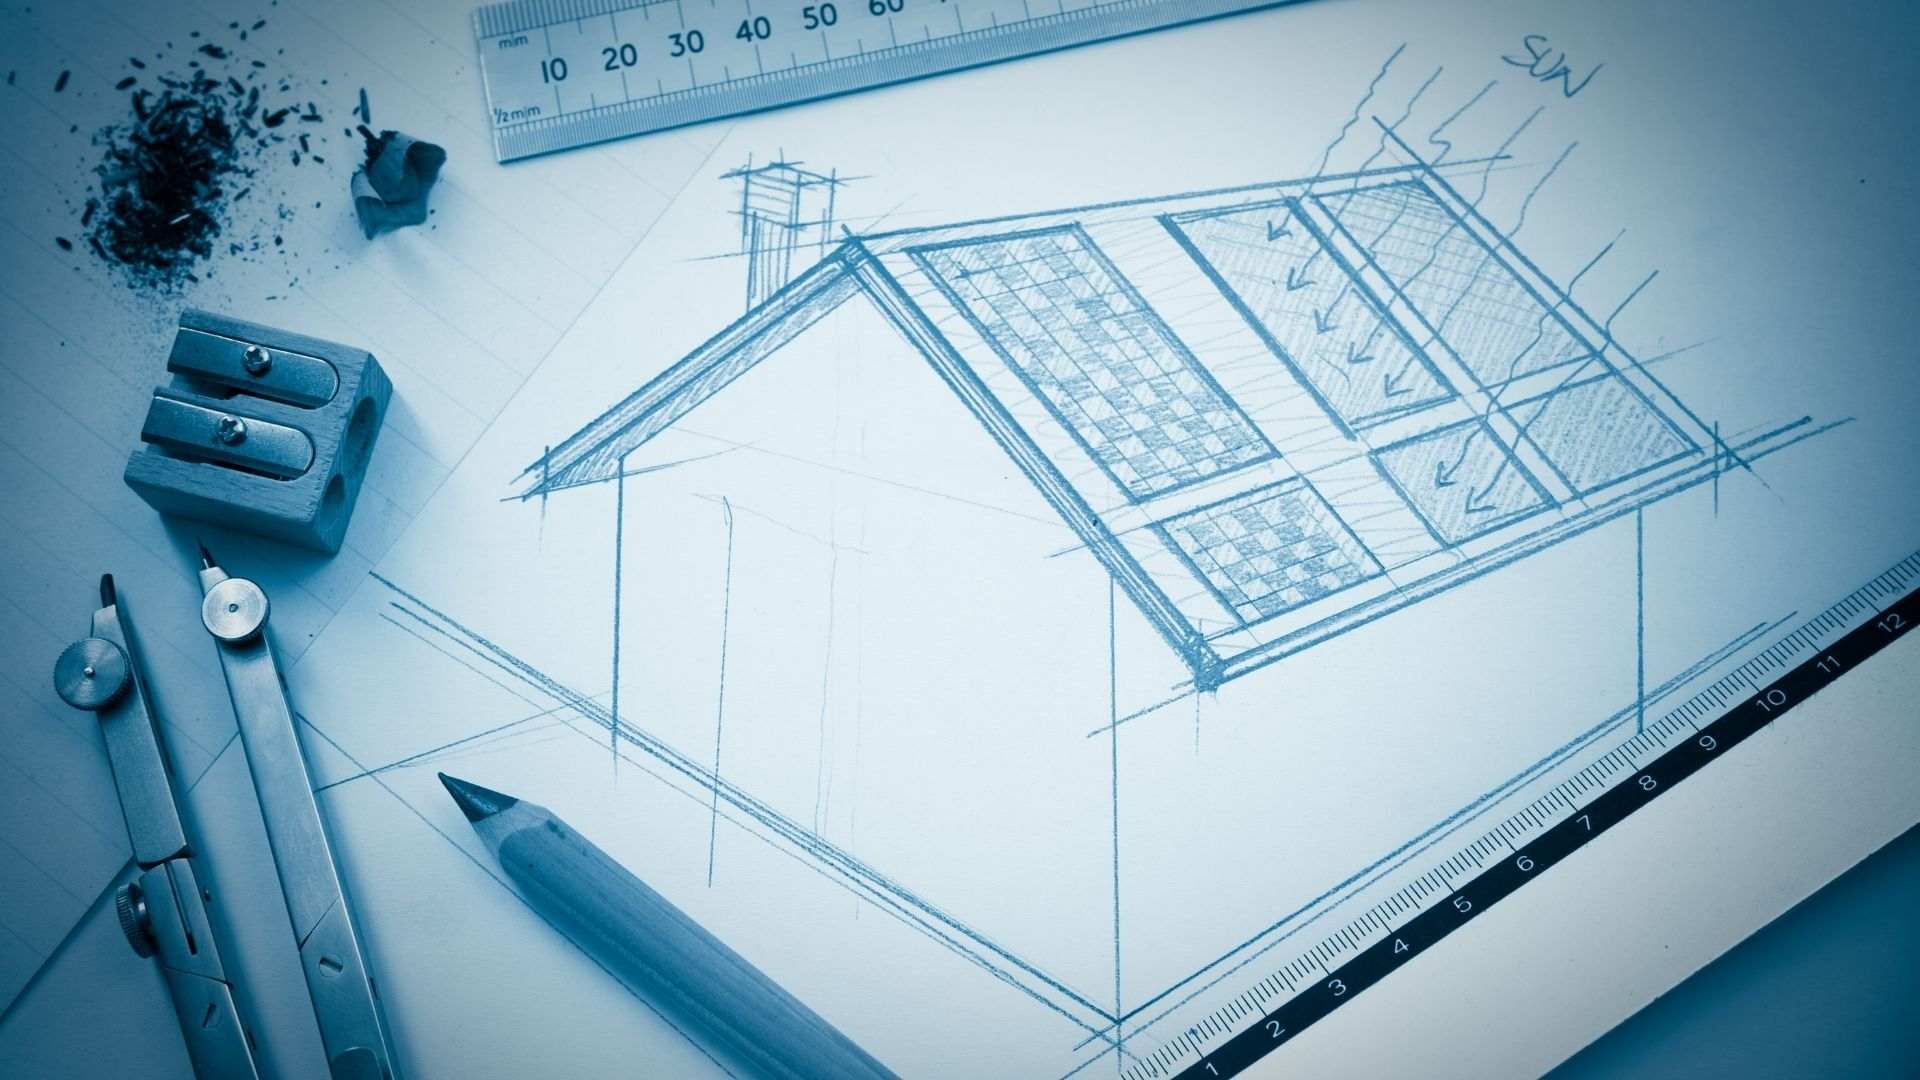 custom drawing of solar engineering design